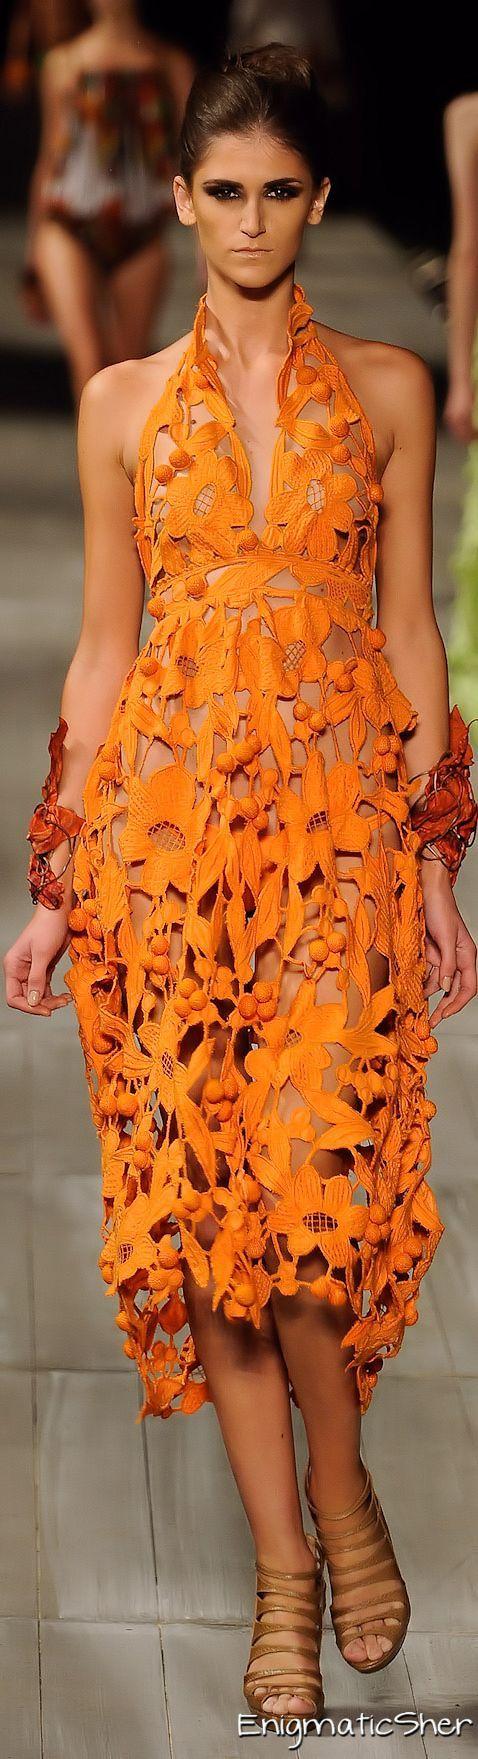 Lenny Niemeyer, brasilianischer Bademode-Designer  - Strandkleid…